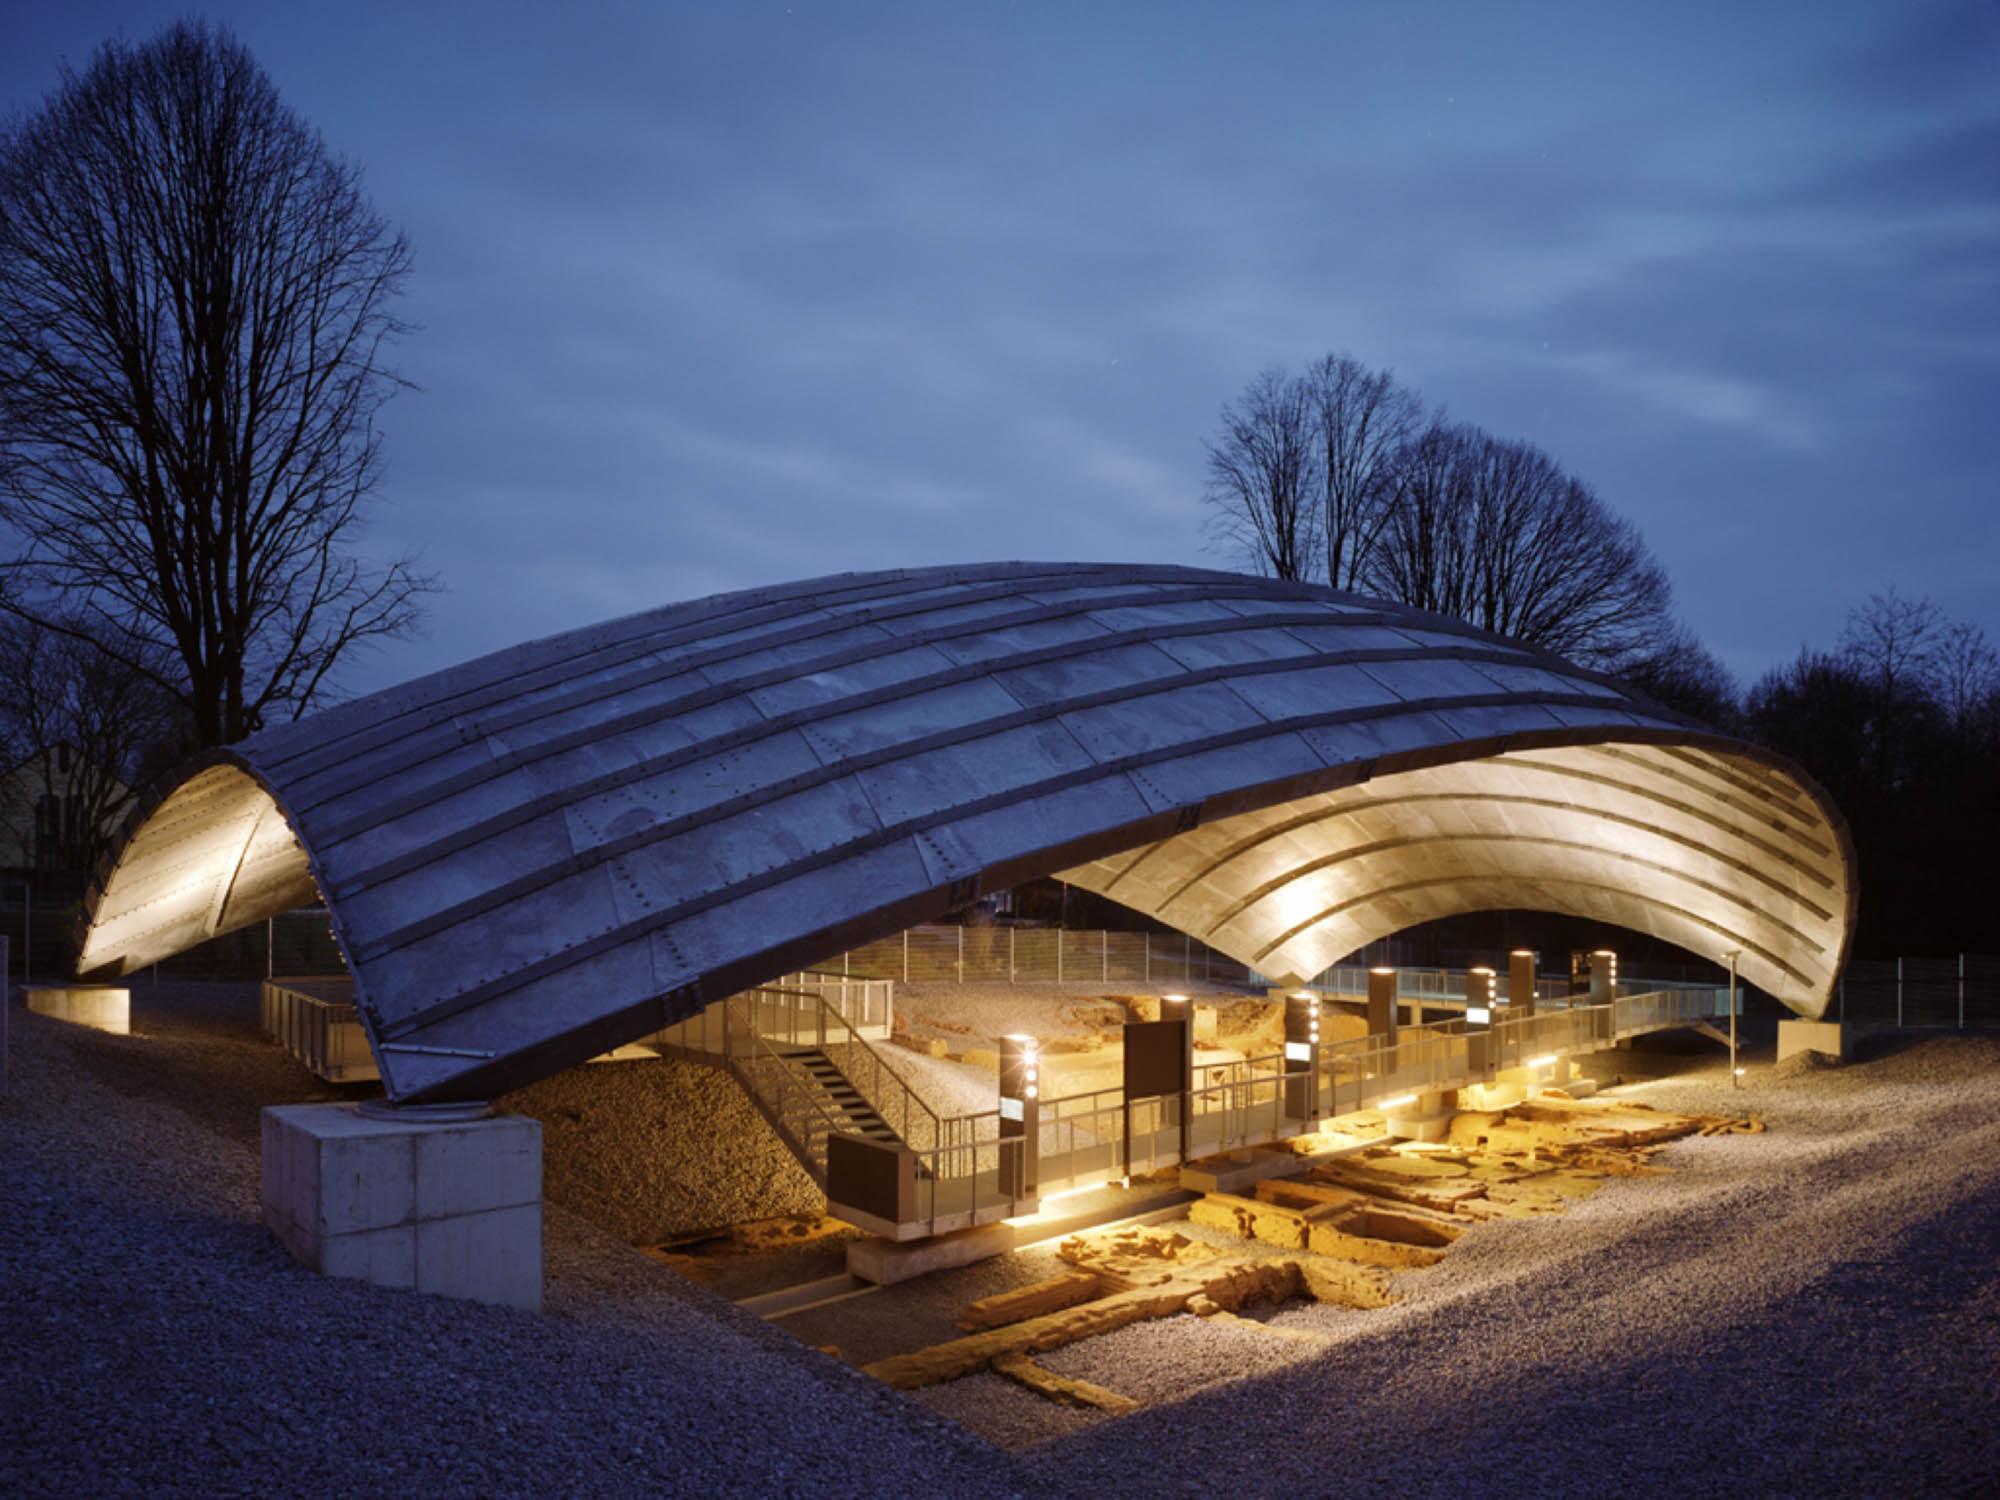 St Antony Hütte in Oberhausen - Wiege der Ruhrindustrie